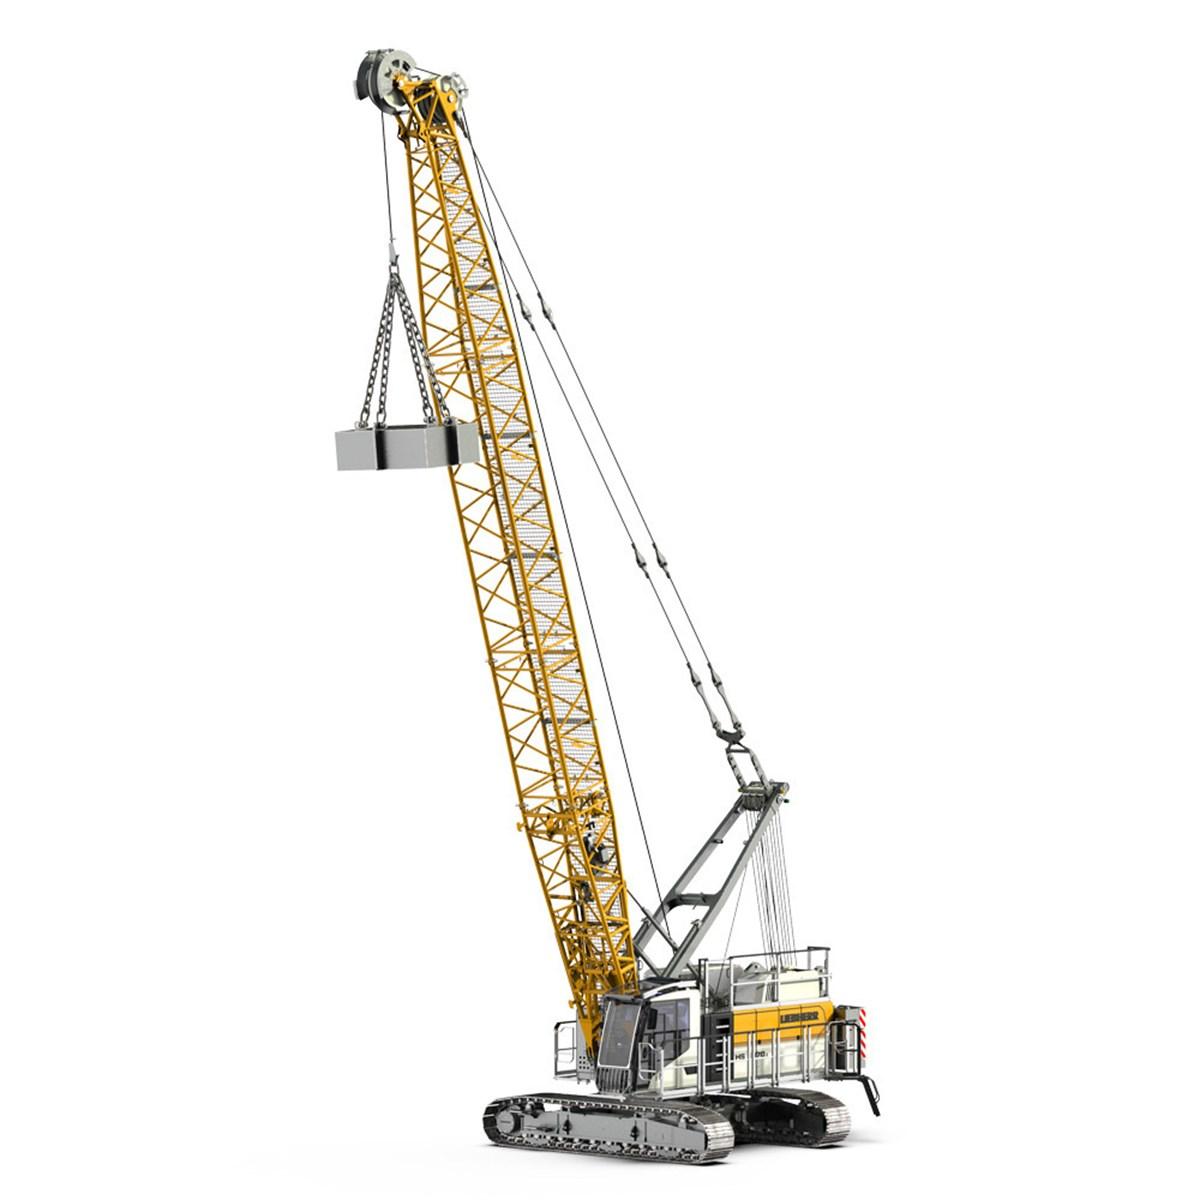 liebherr-hs-8070-1-seilbagger-duty-cycle-crawler-crane-dynamic-soil-compacti.jpg